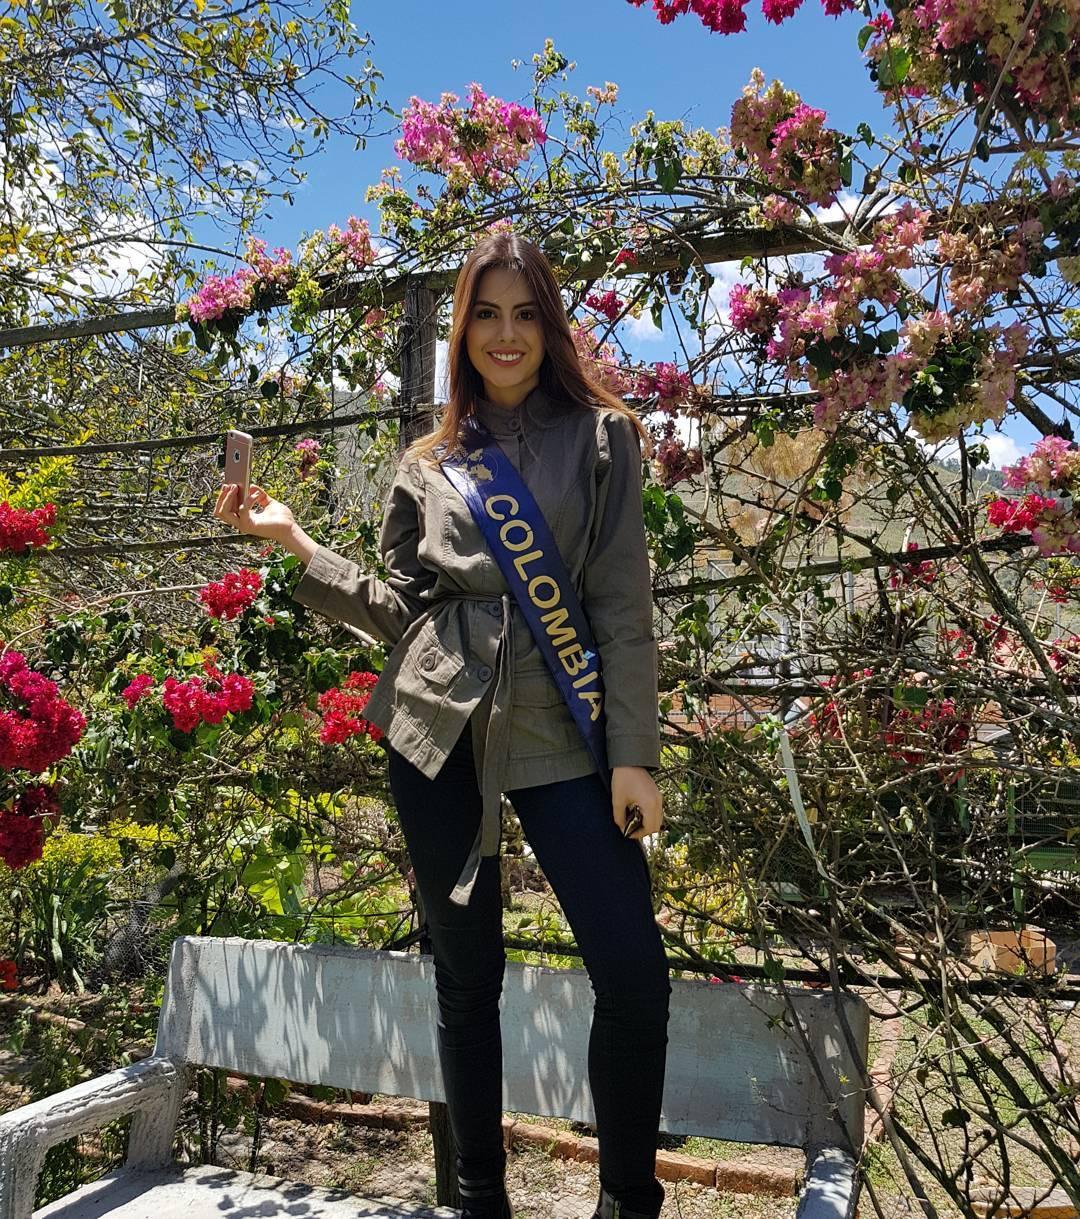 yennifer hernandez jaimes, miss colombia continentes unidos 2017. - Página 5 Qphqvw8r